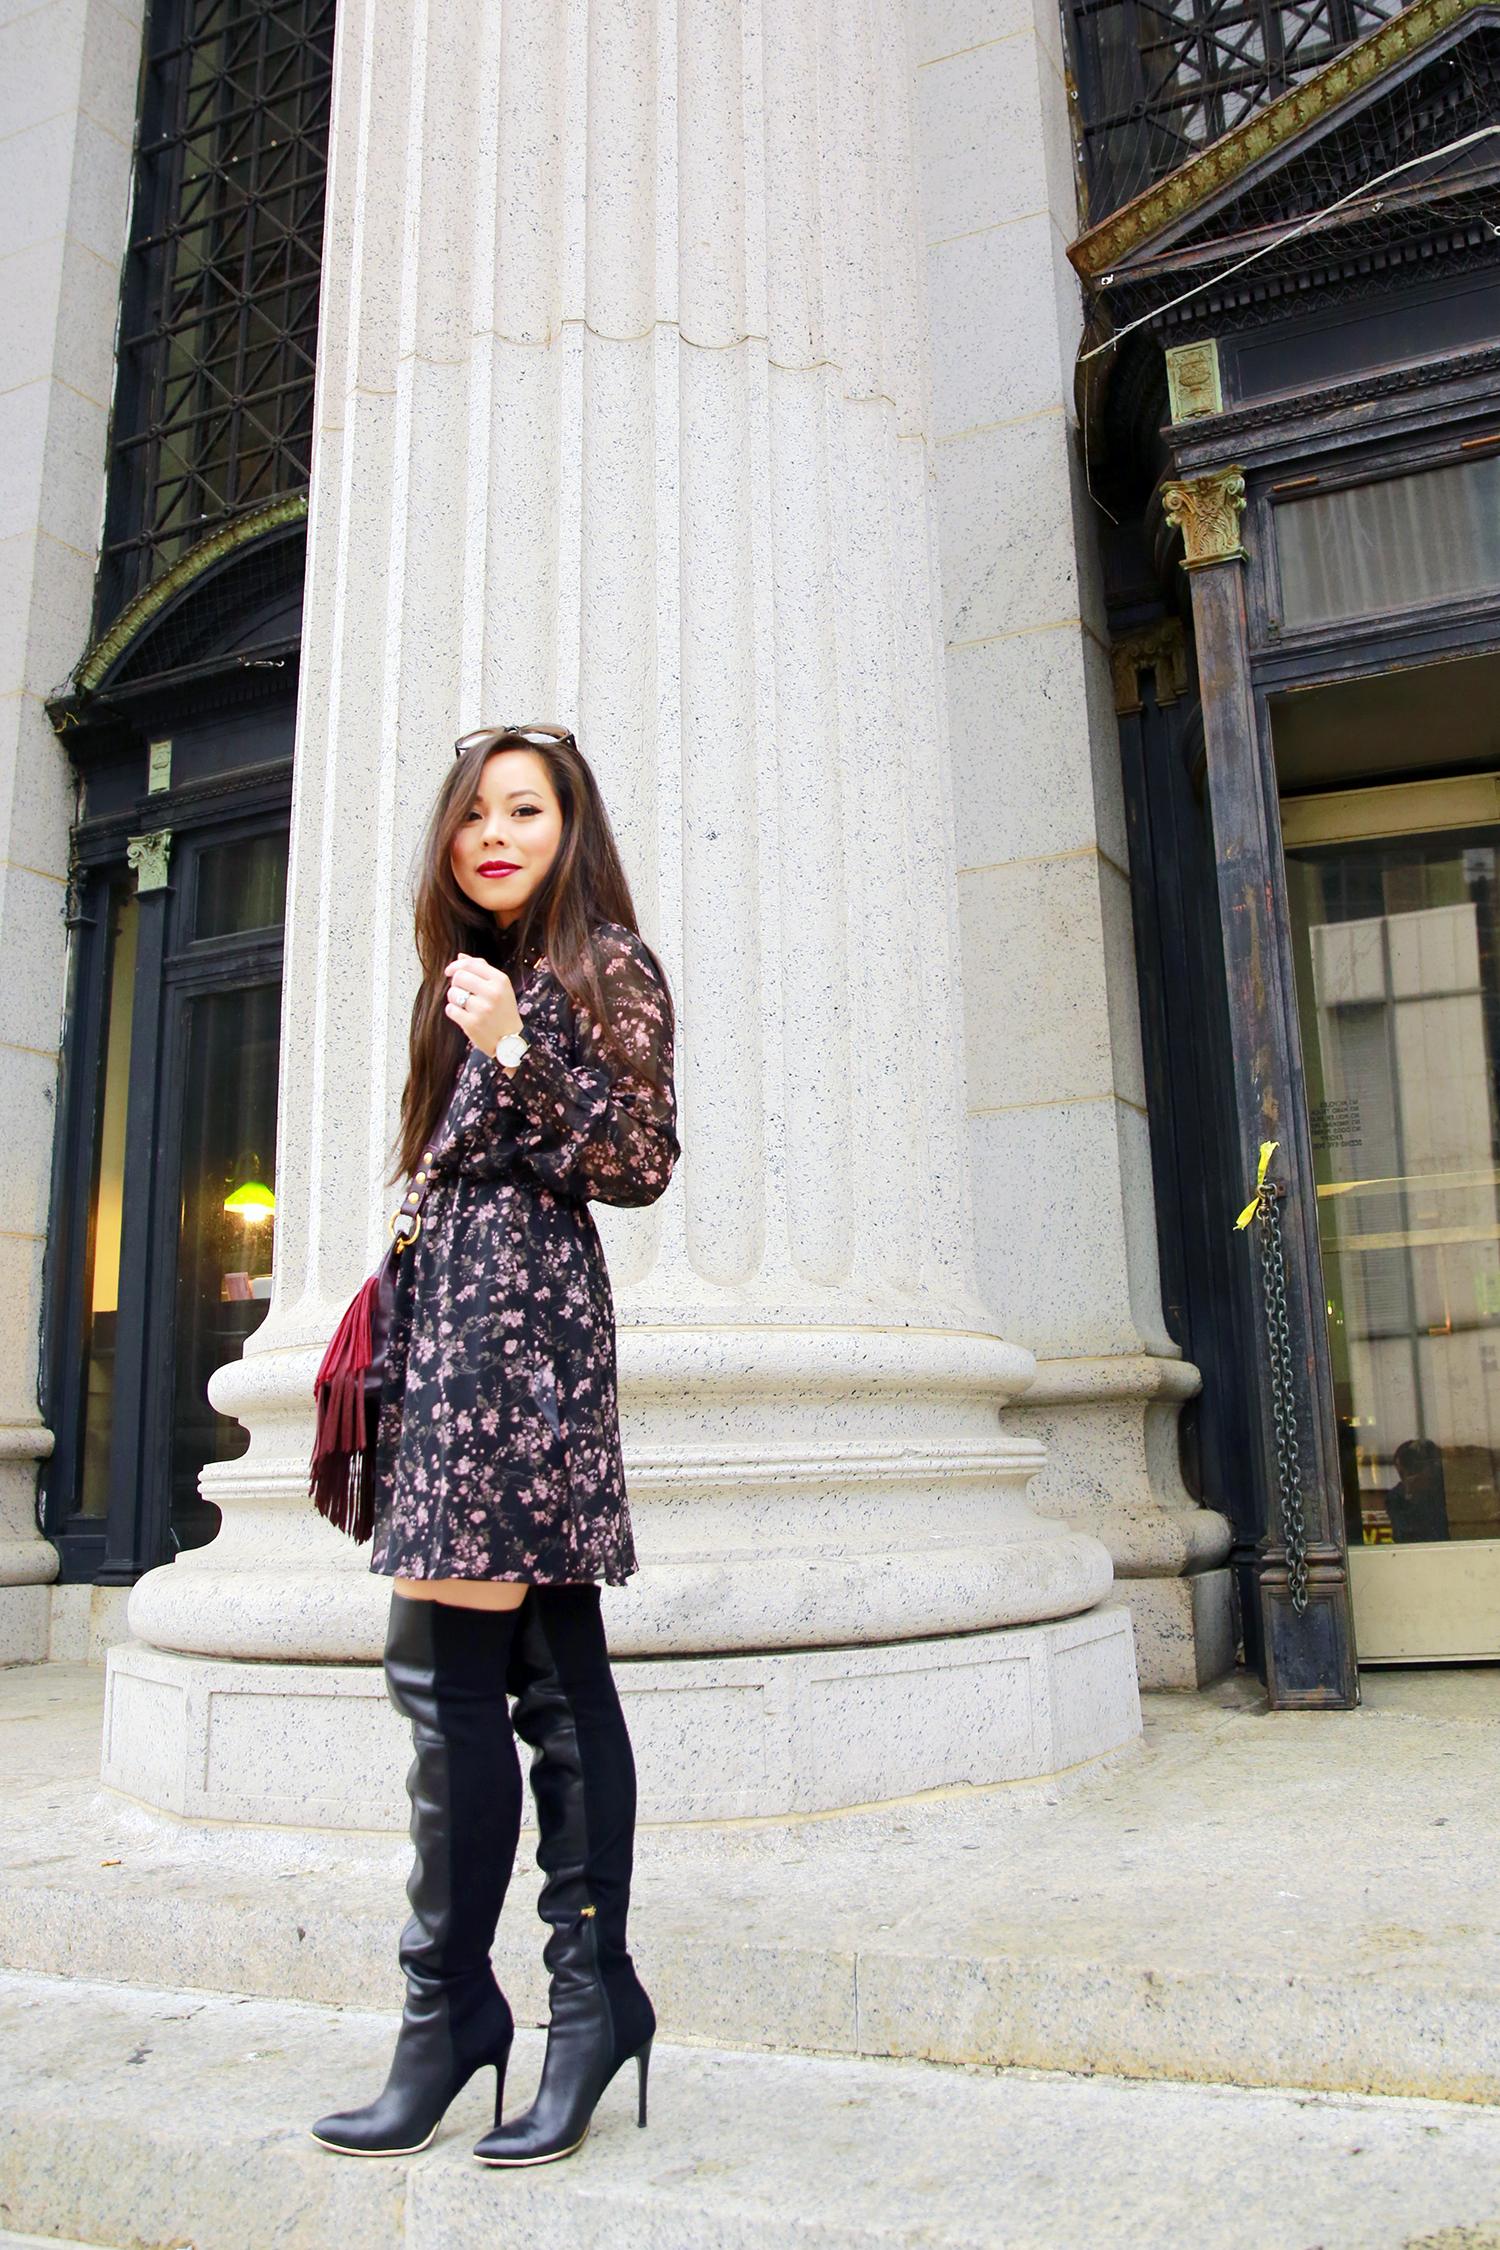 Hautepinkpretty new york fashion week day 1 a pop of malbec for When is fashion week over